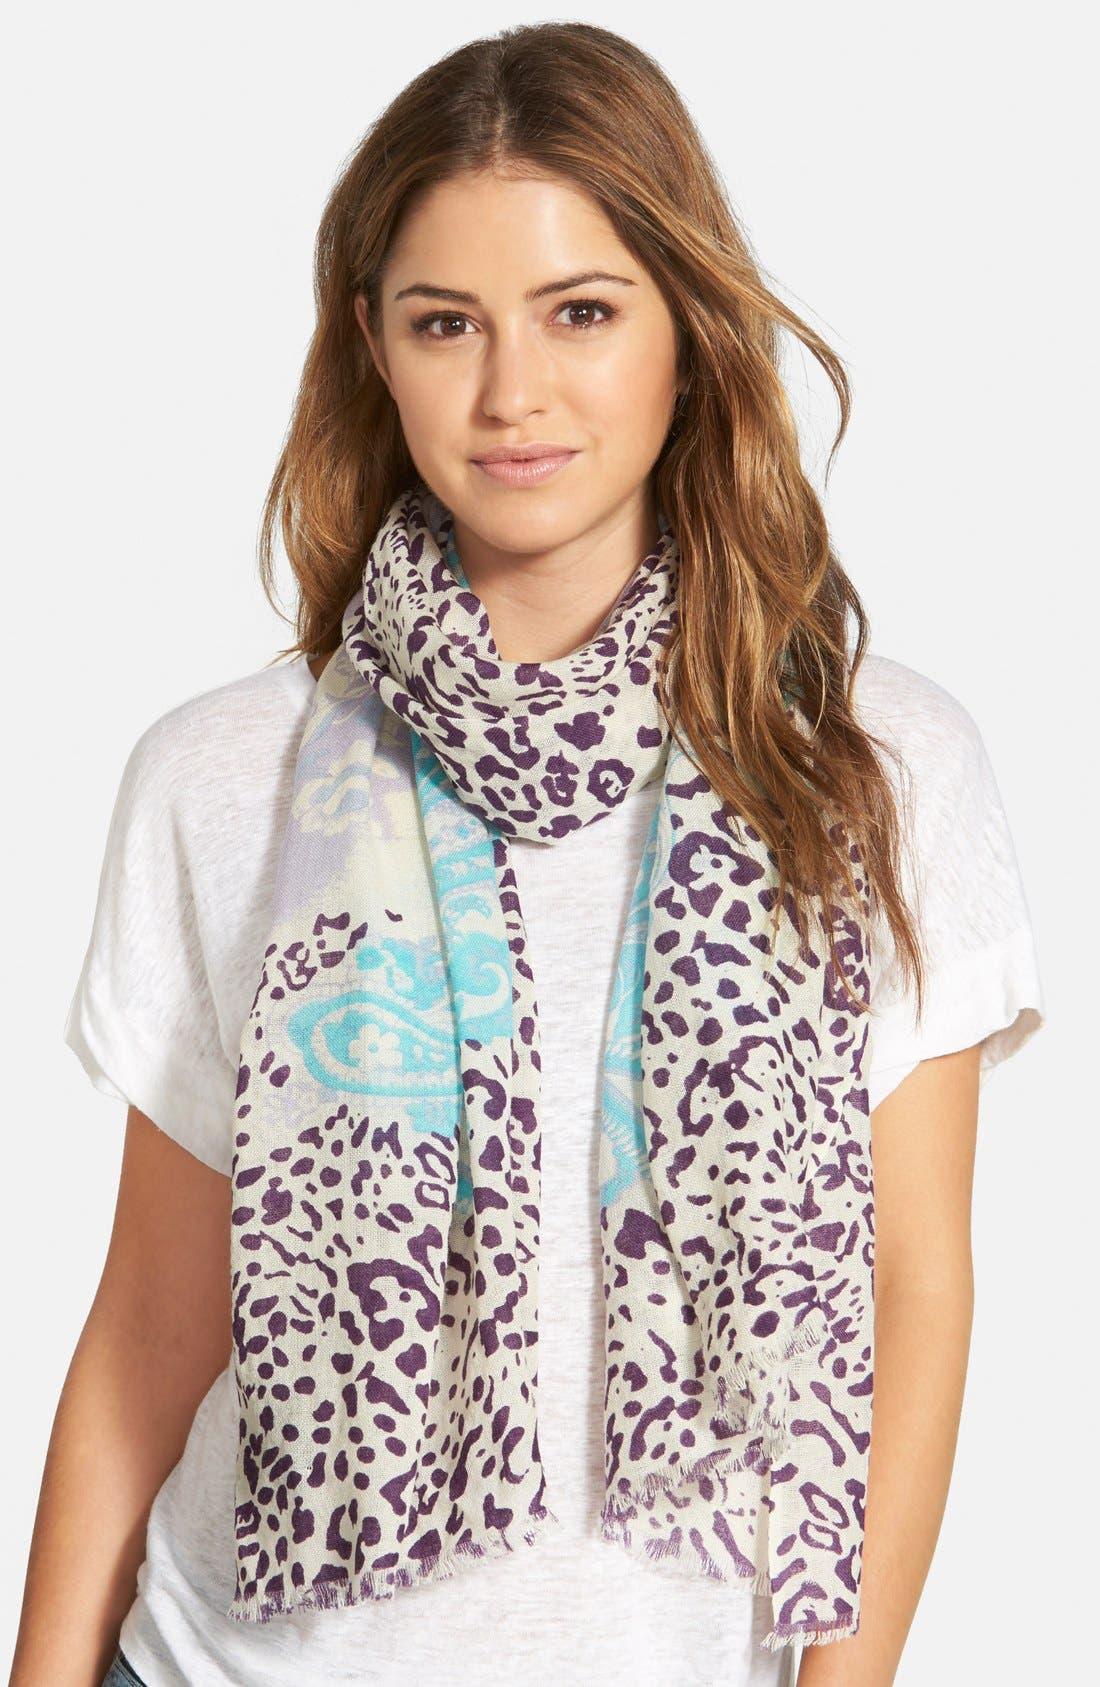 Alternate Image 1 Selected - La Fiorentina Mixed Print Wool Scarf